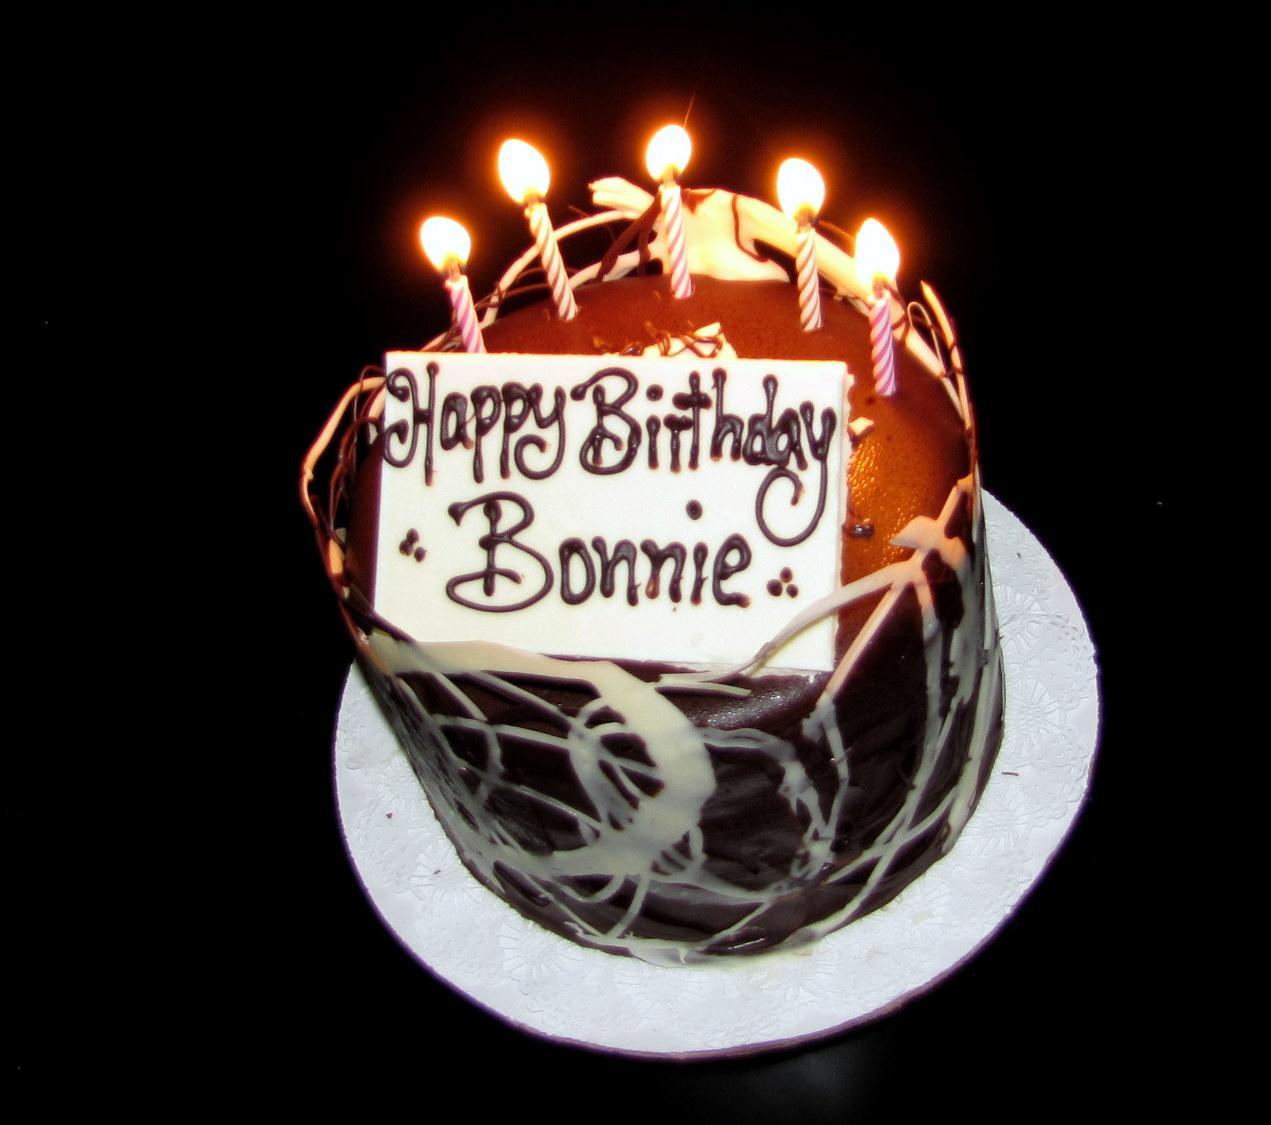 Happy birthday grandma publicscrutiny Image collections